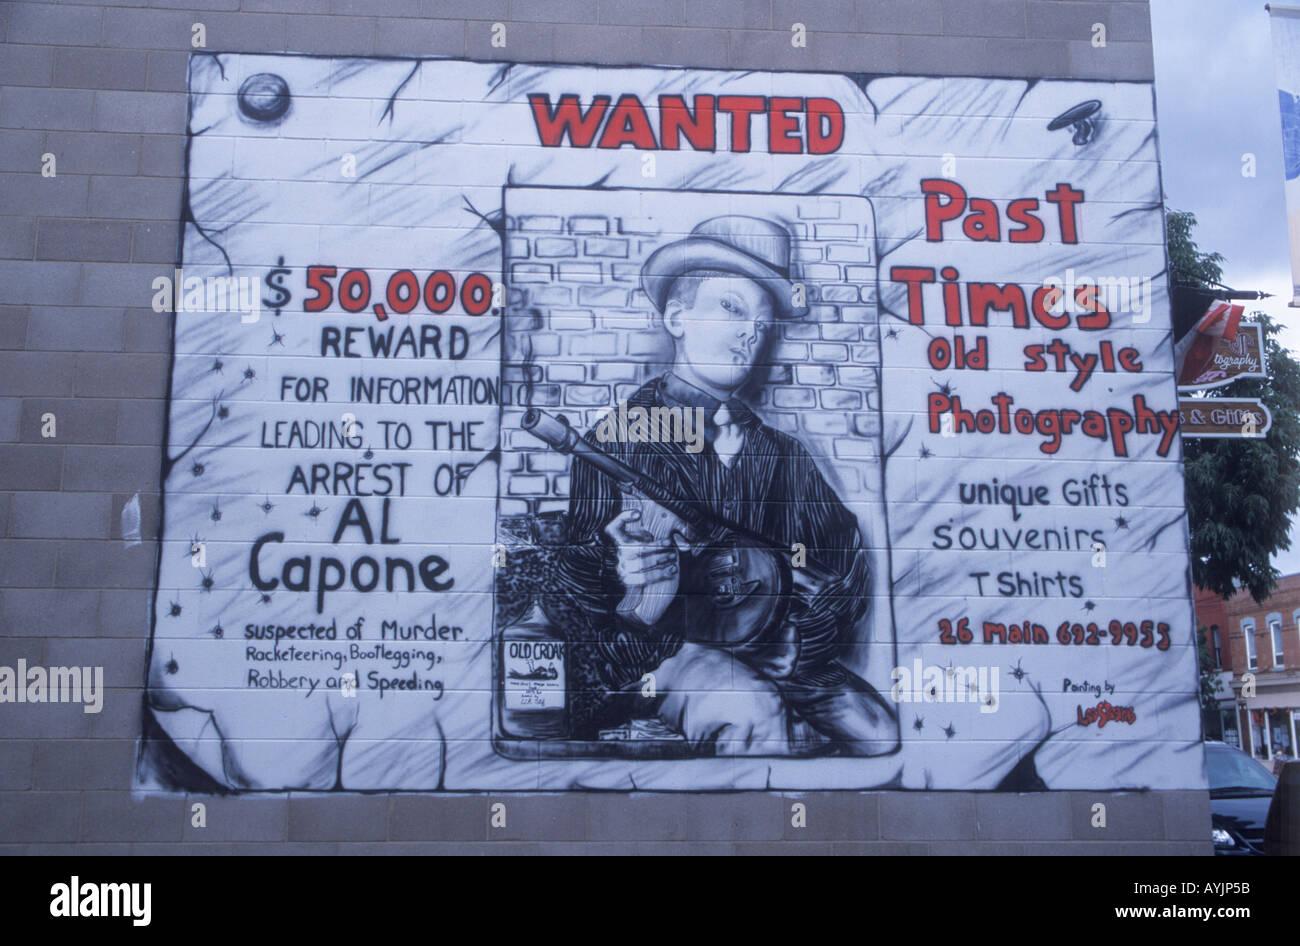 Al Capone Stock Photos & Al Capone Stock Images - Alamy